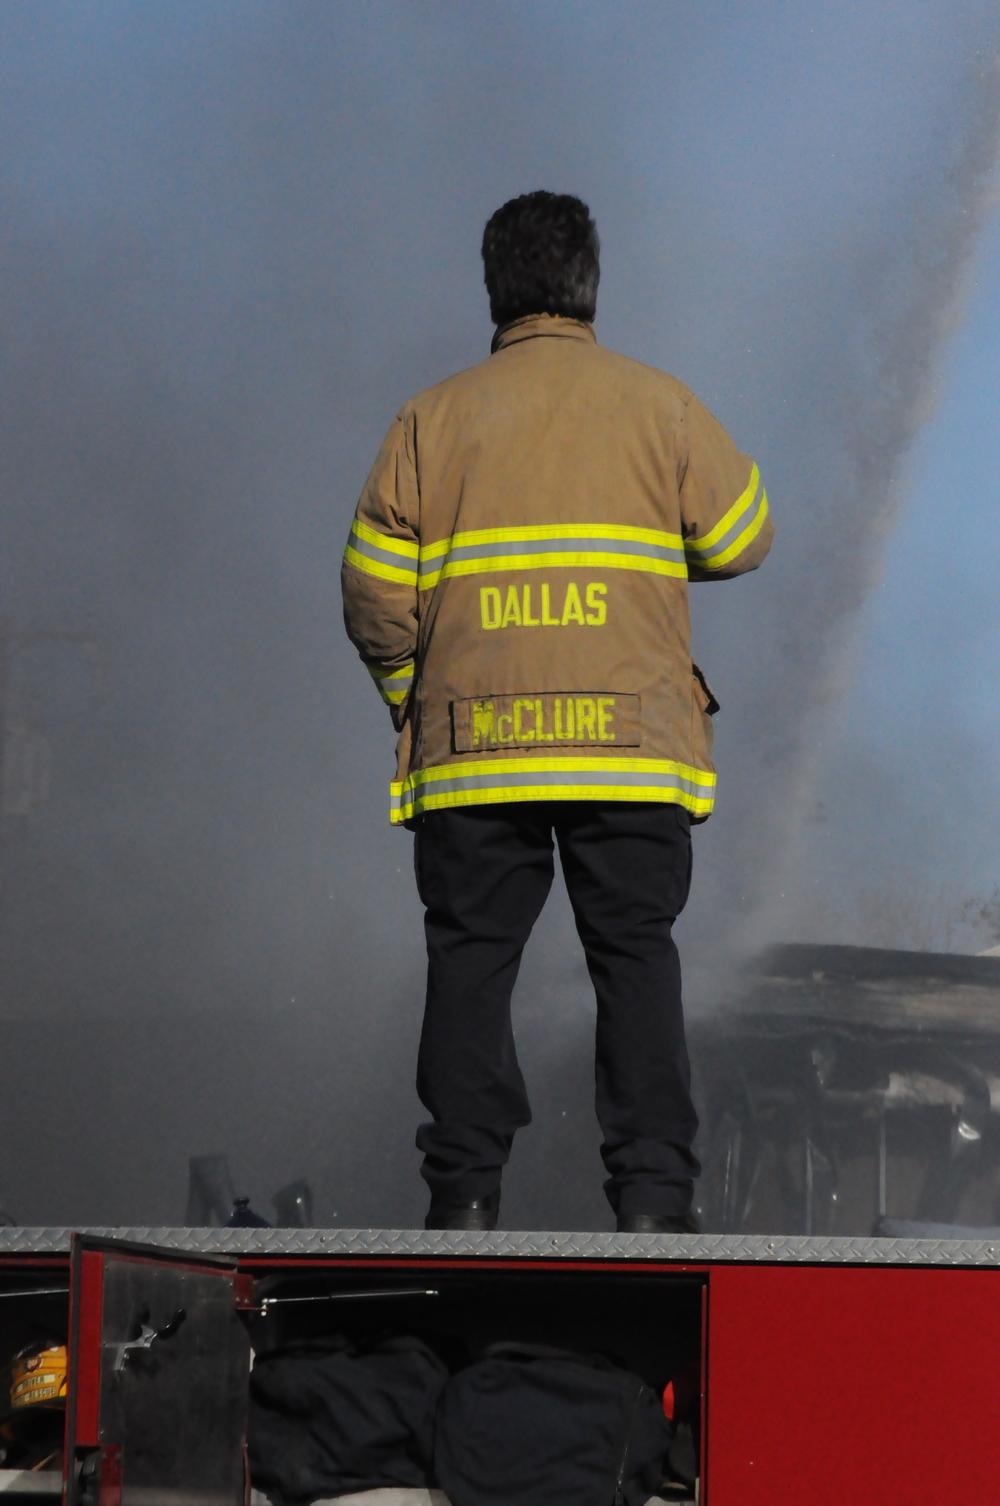 4-11 Dallas-2.24.13 (69).JPG